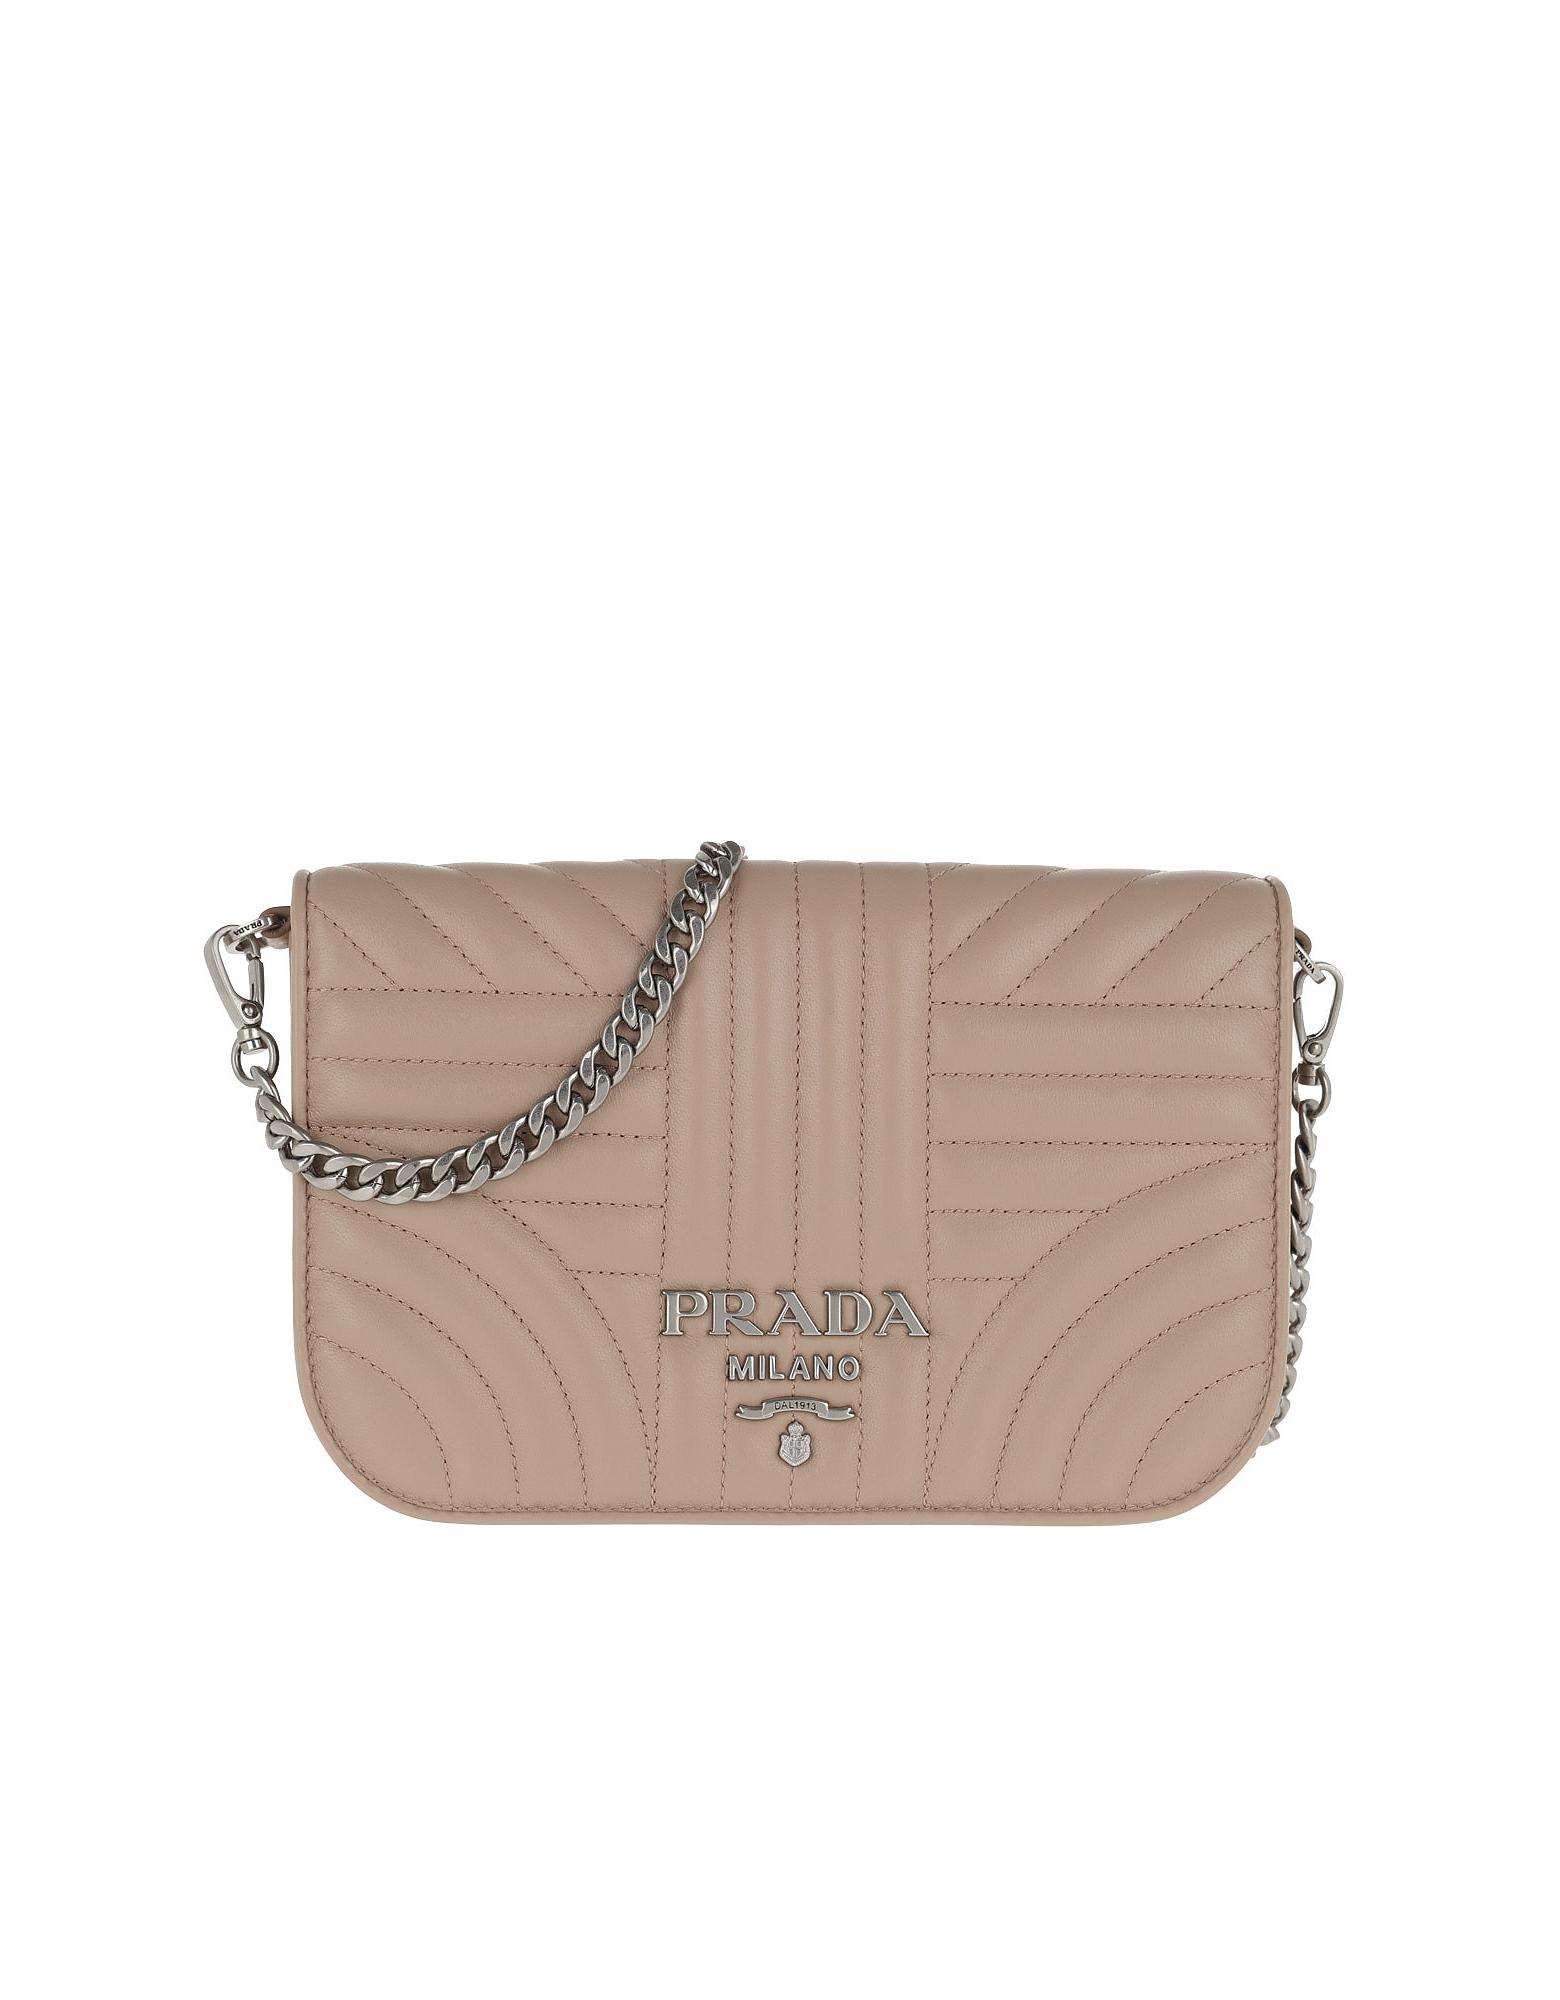 Prada Designer Handbags, Quilted Diagramme Nappa Leather Bag Cipria